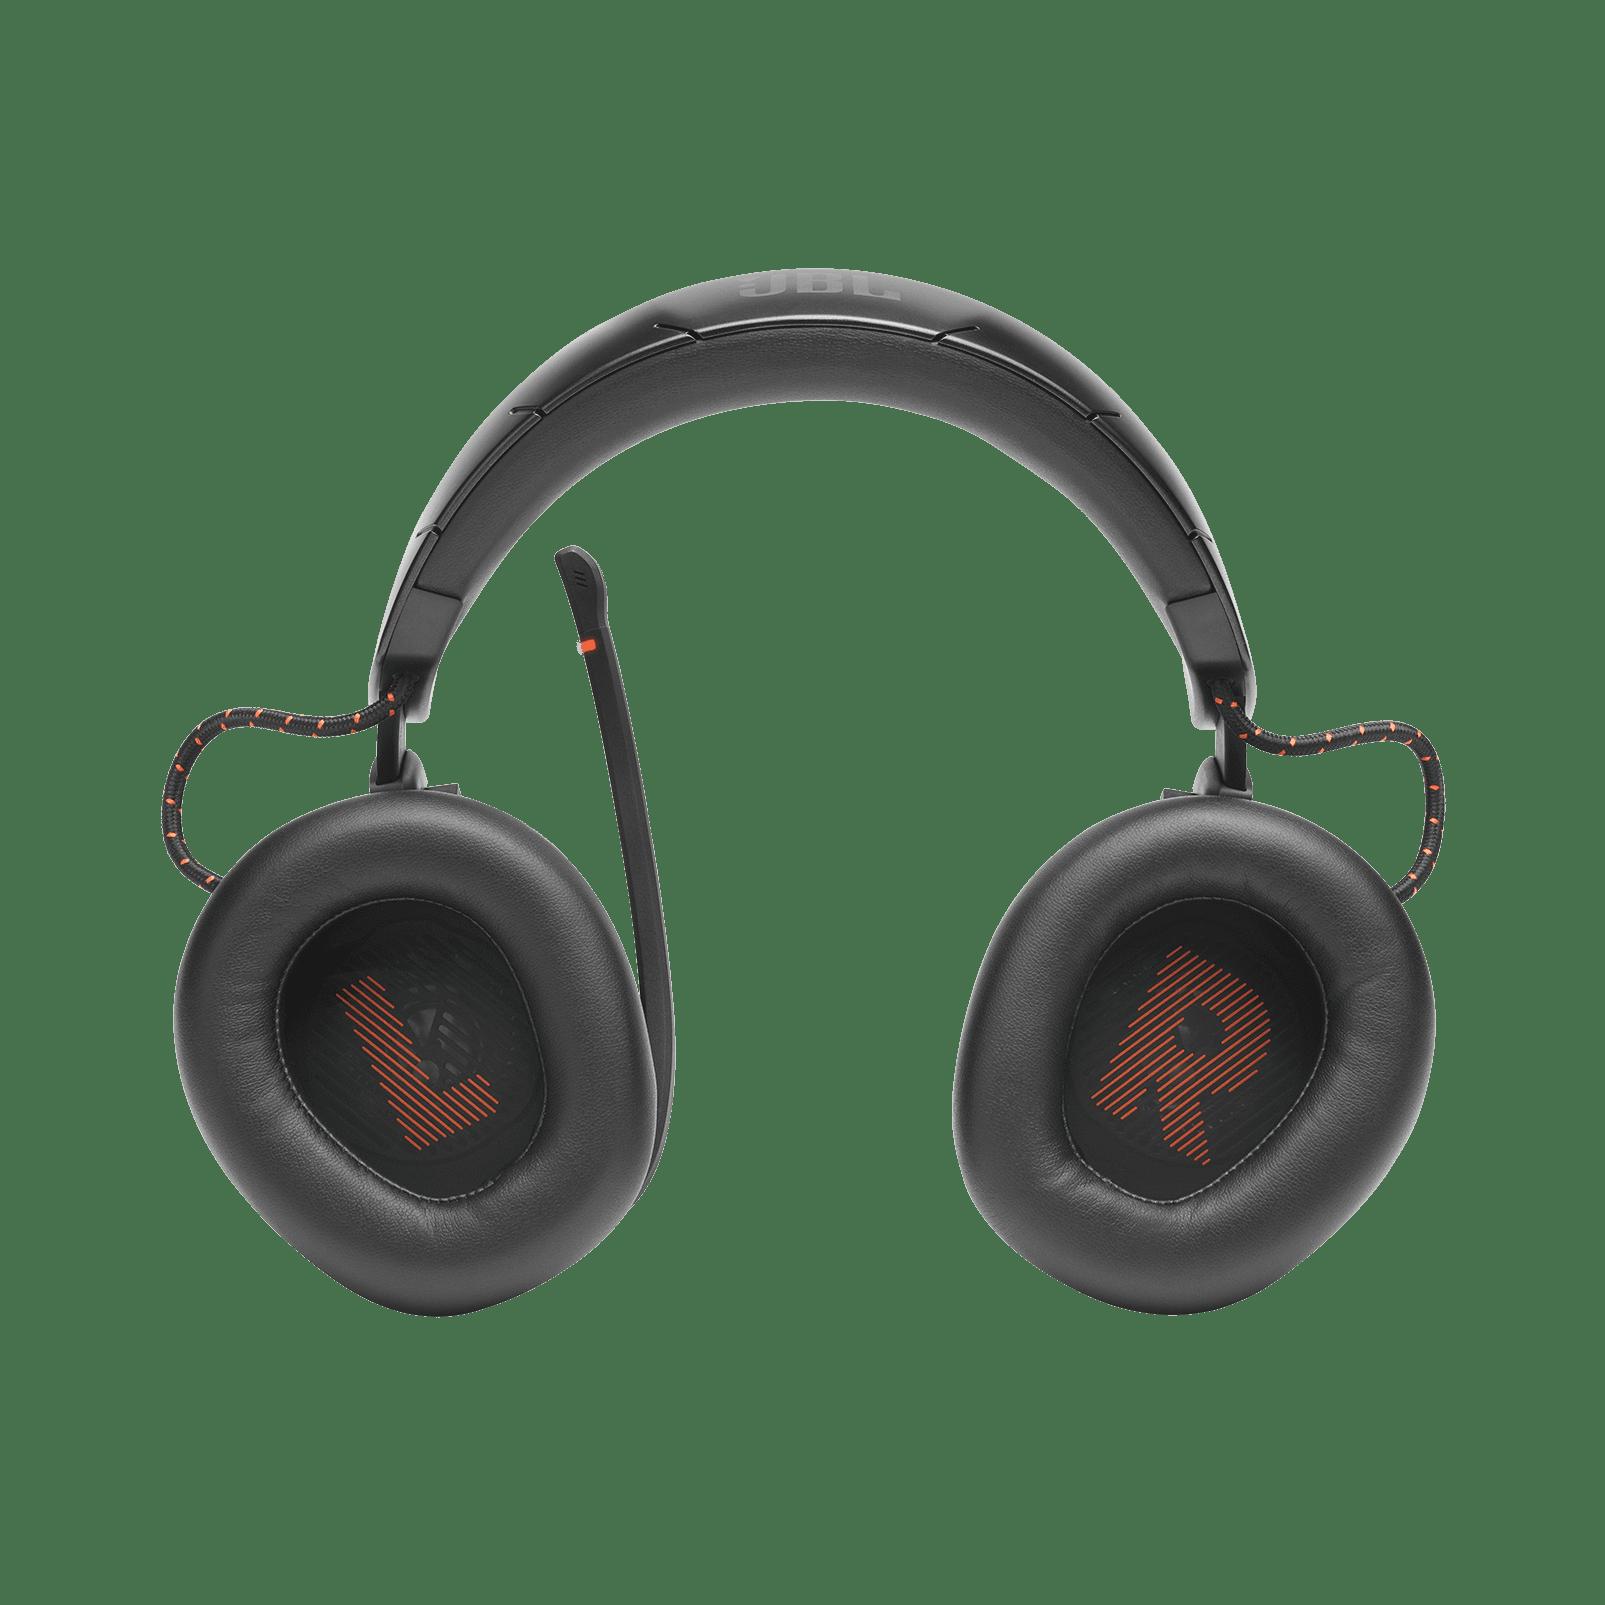 JBL Quantum 600 im Test: Kabelloser Klanggigant